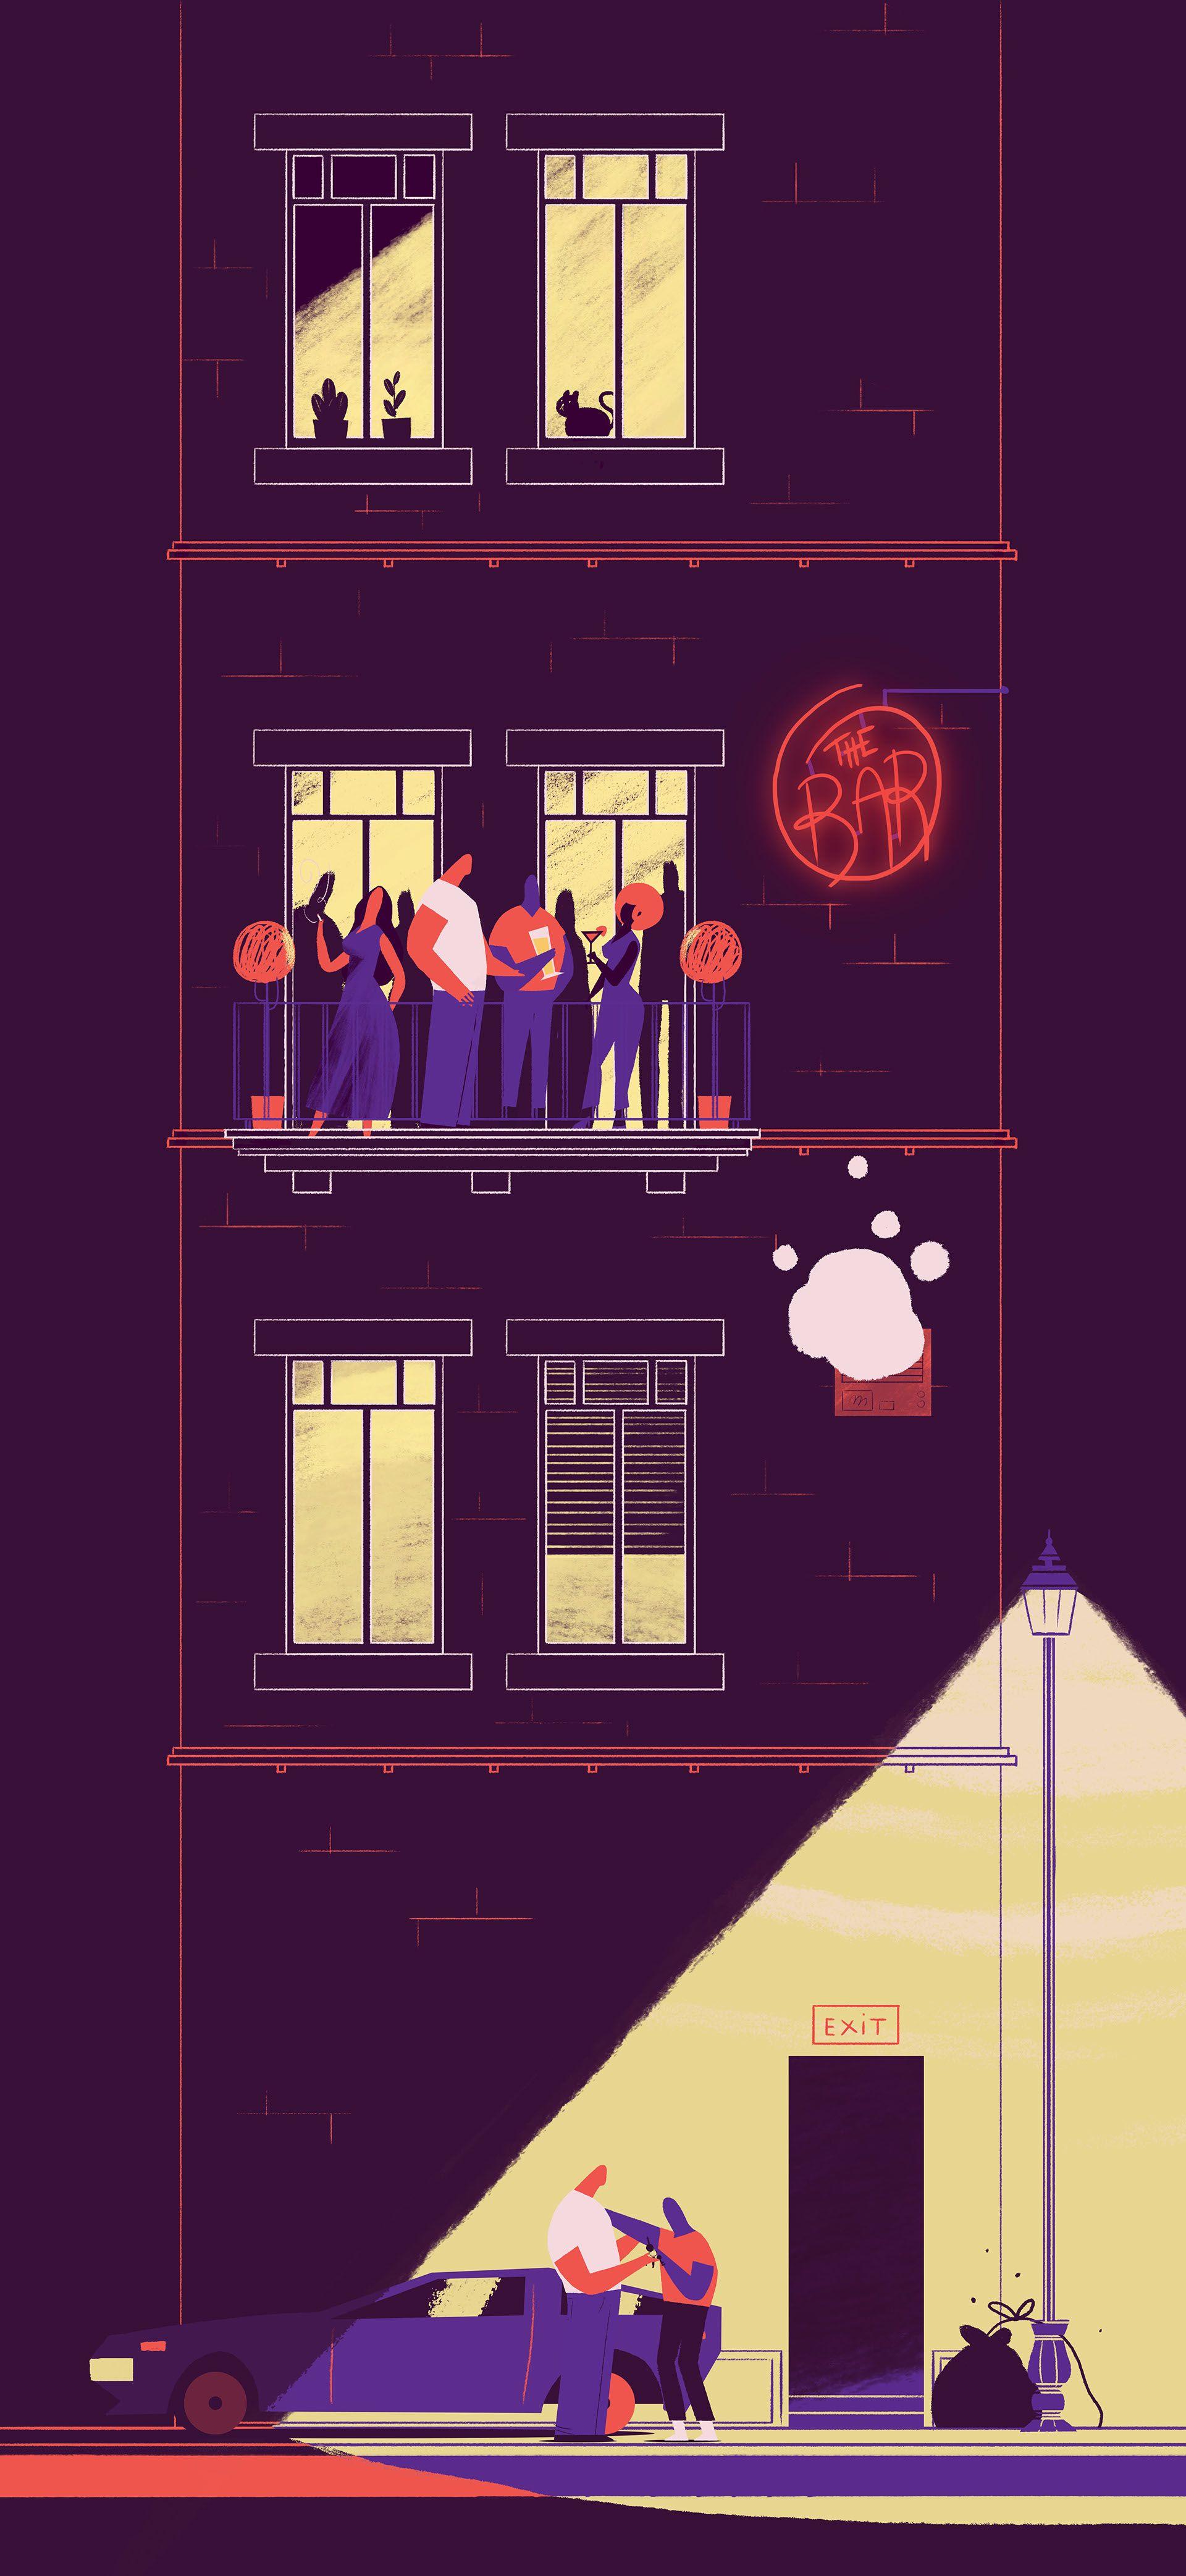 Purple Drive Storyboard On Behance Behance Ilustraciones Ilustraciones Planas